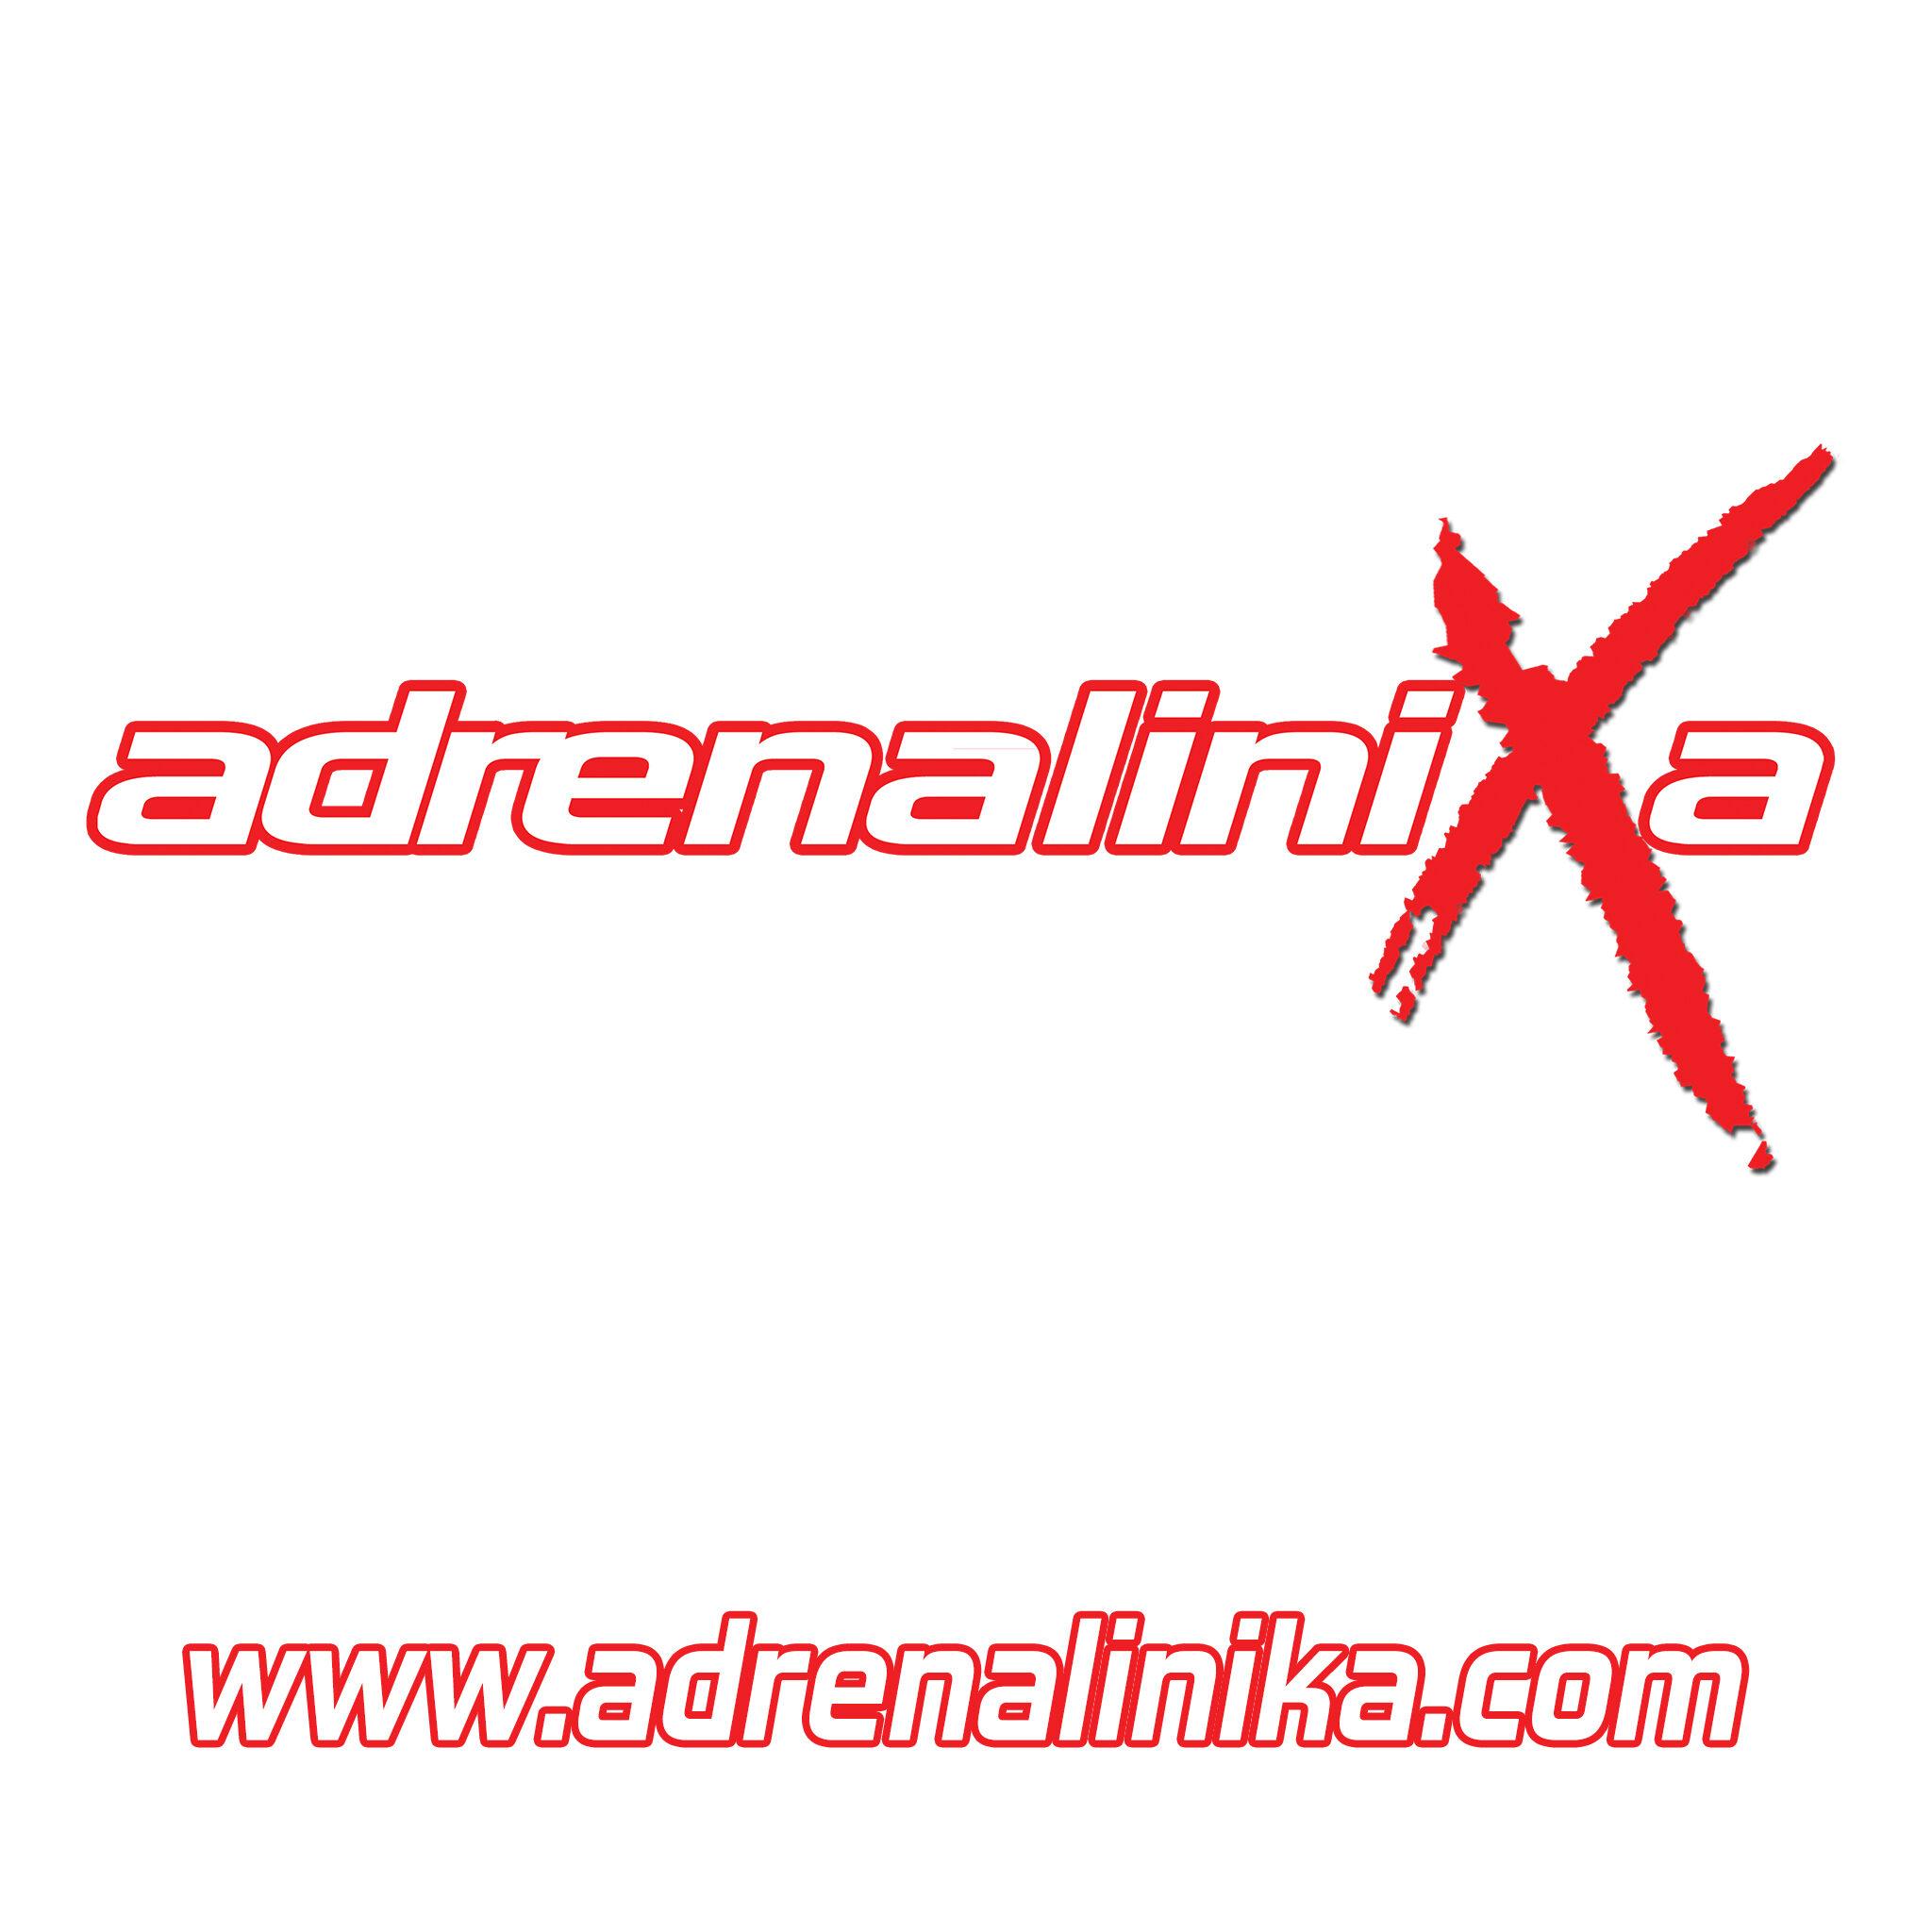 Adrenalinika